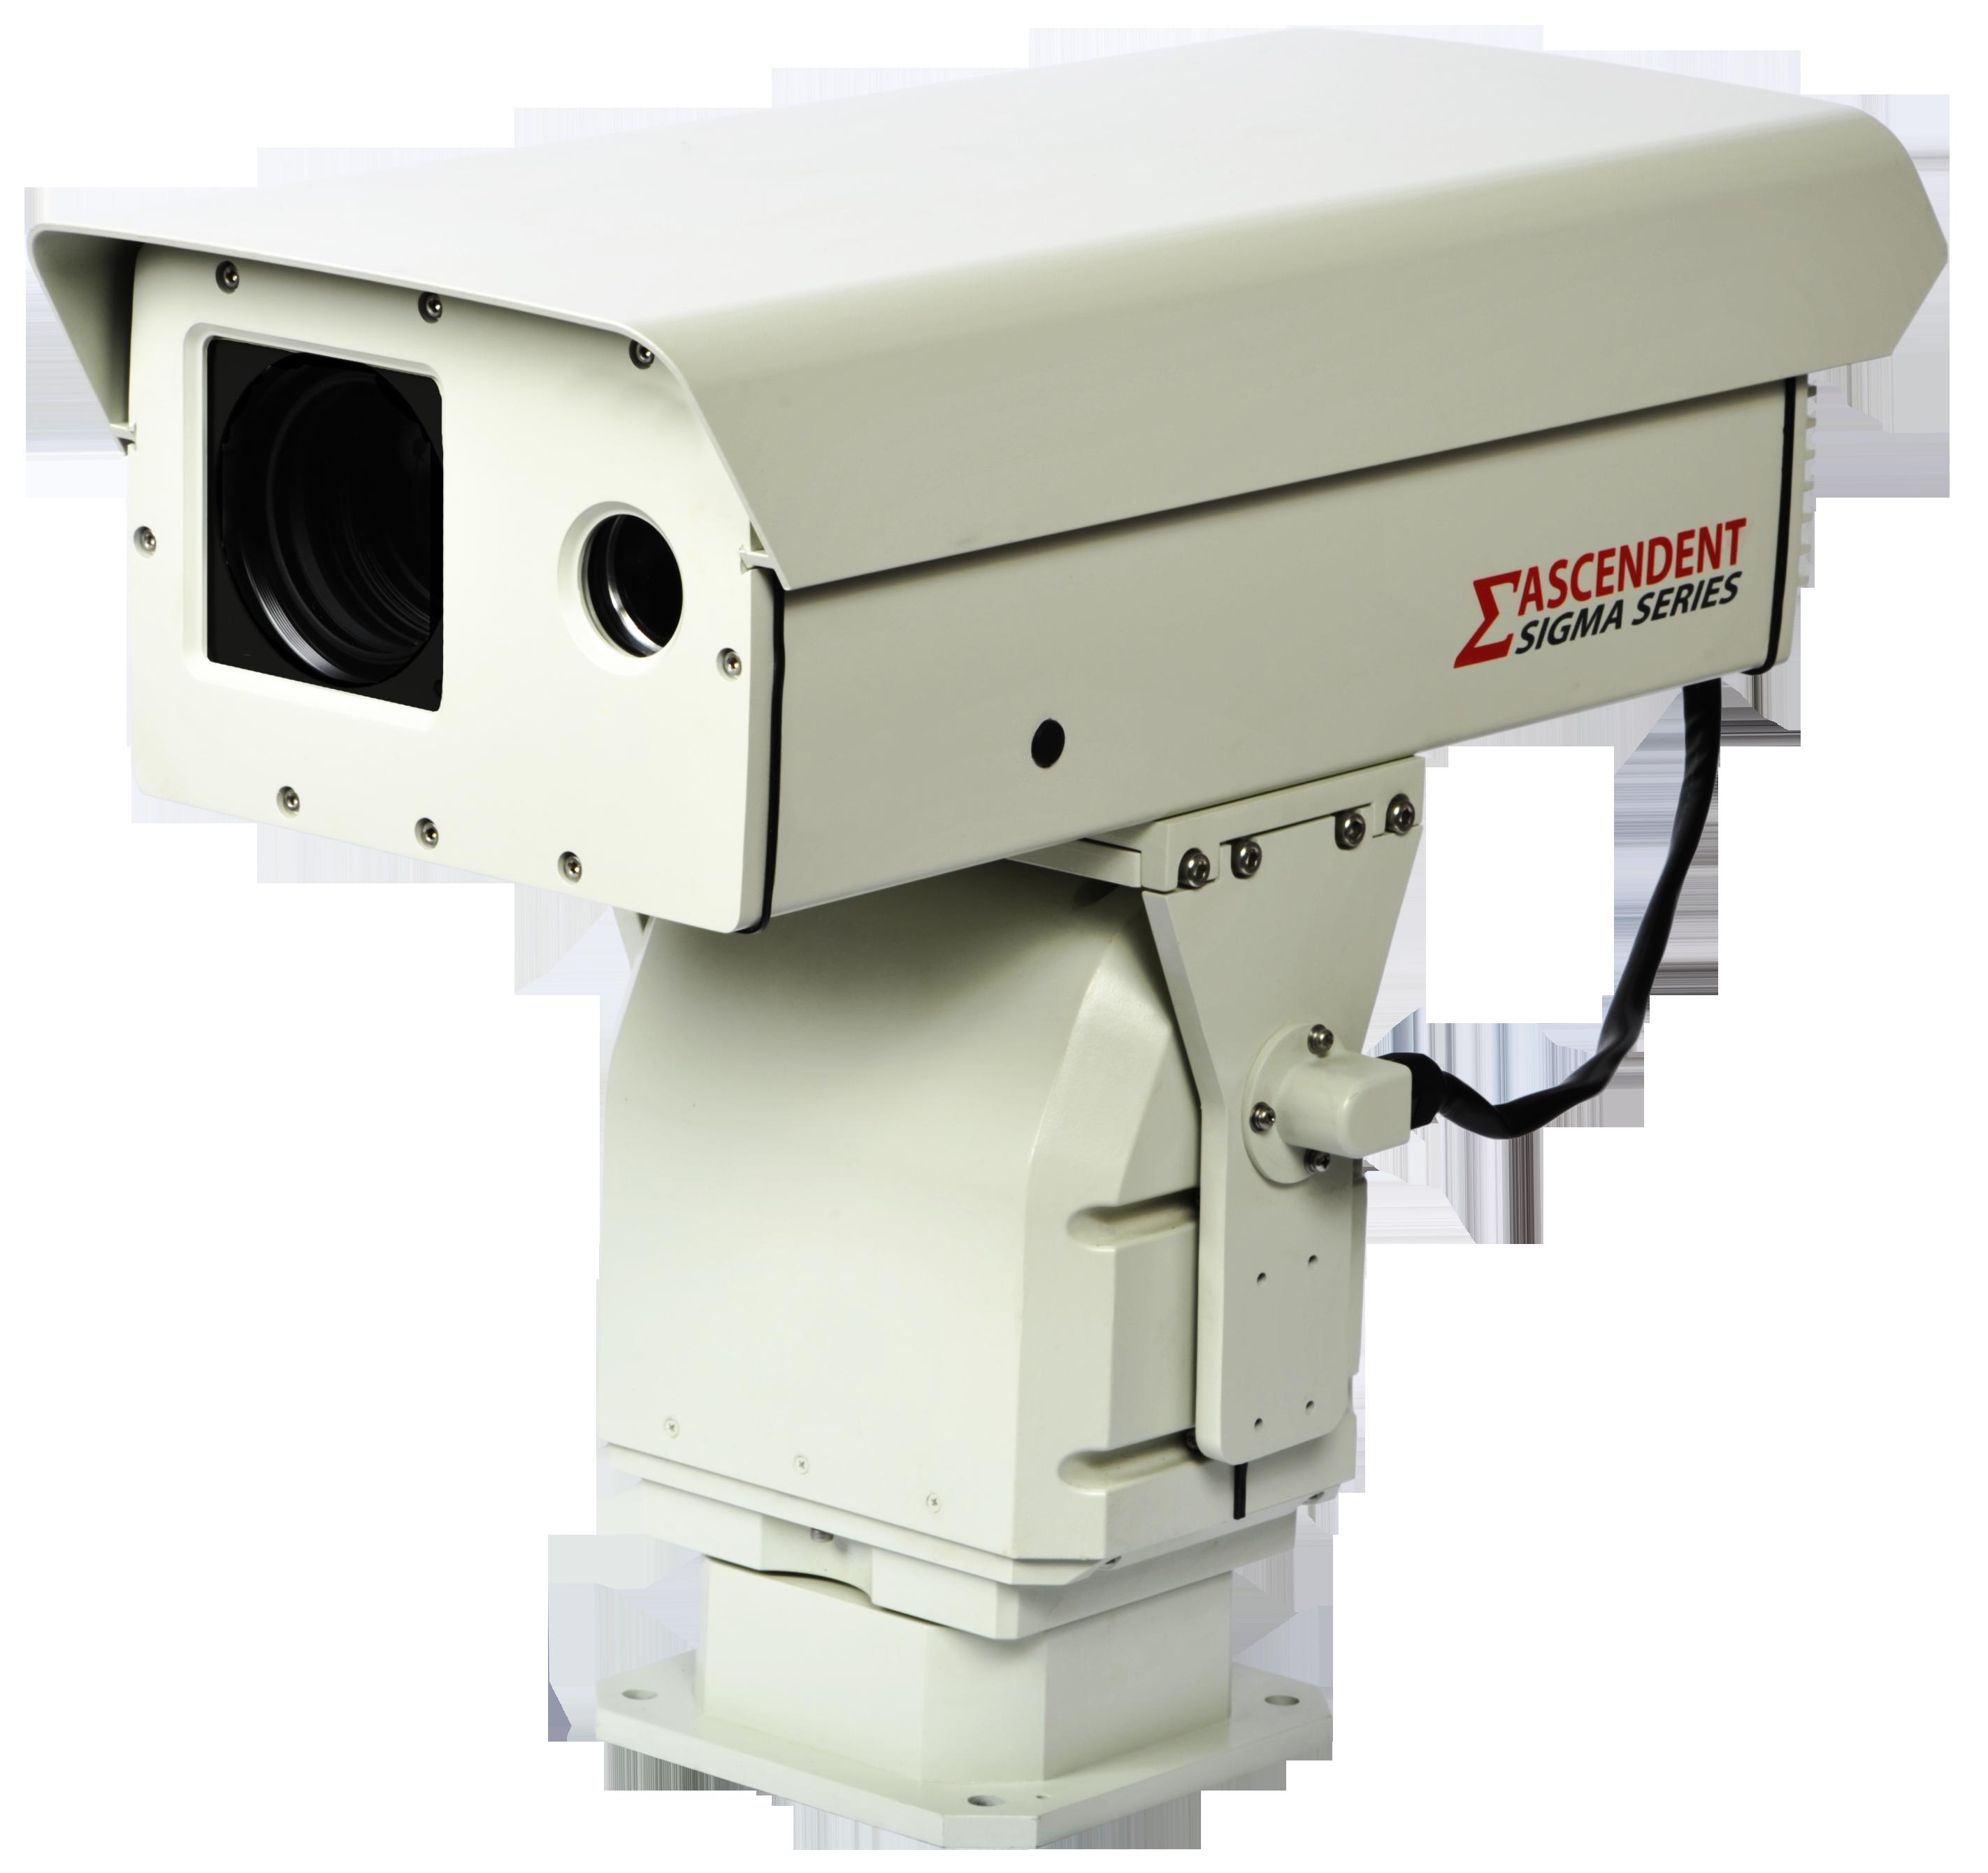 Ascendent Night Vision Long Range Laser Ir Ptz Camera With